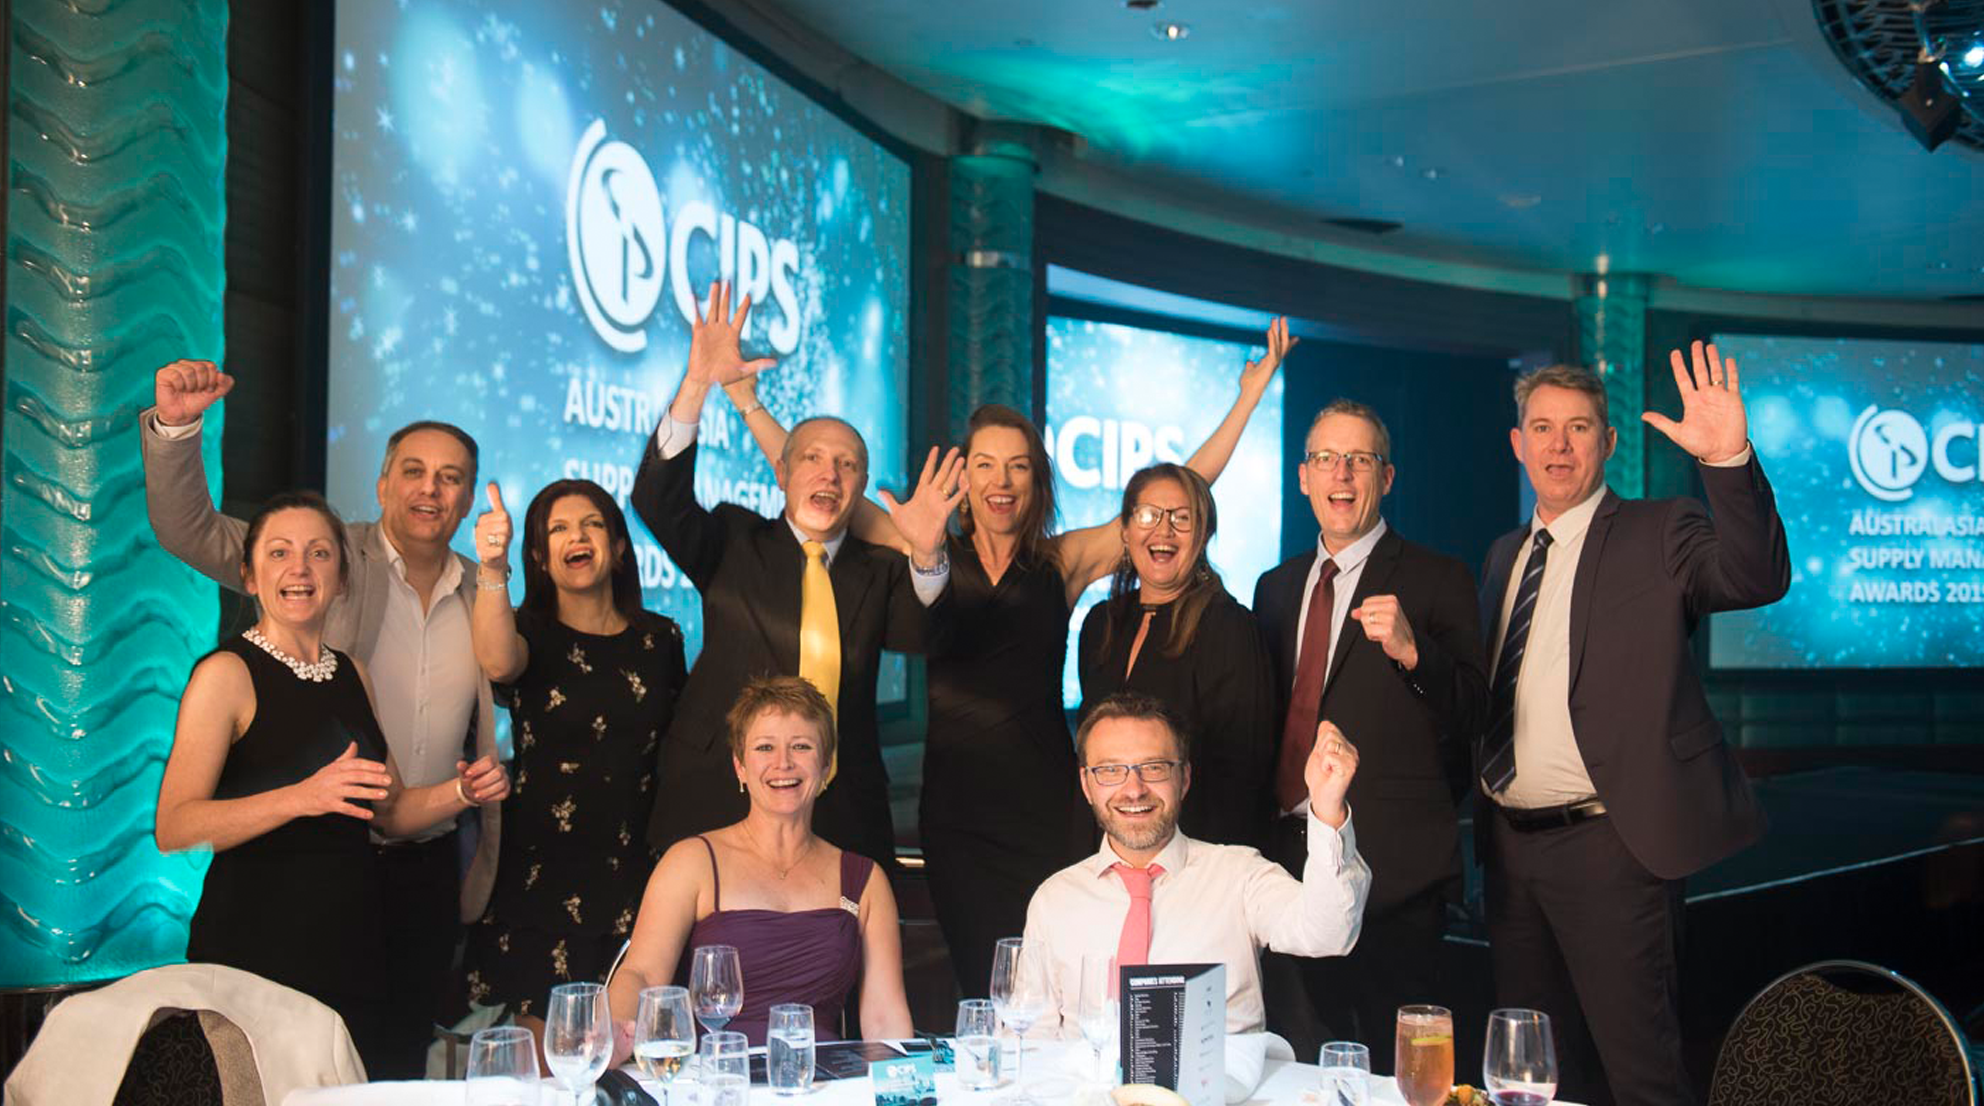 CIPS, Supply Management Awards